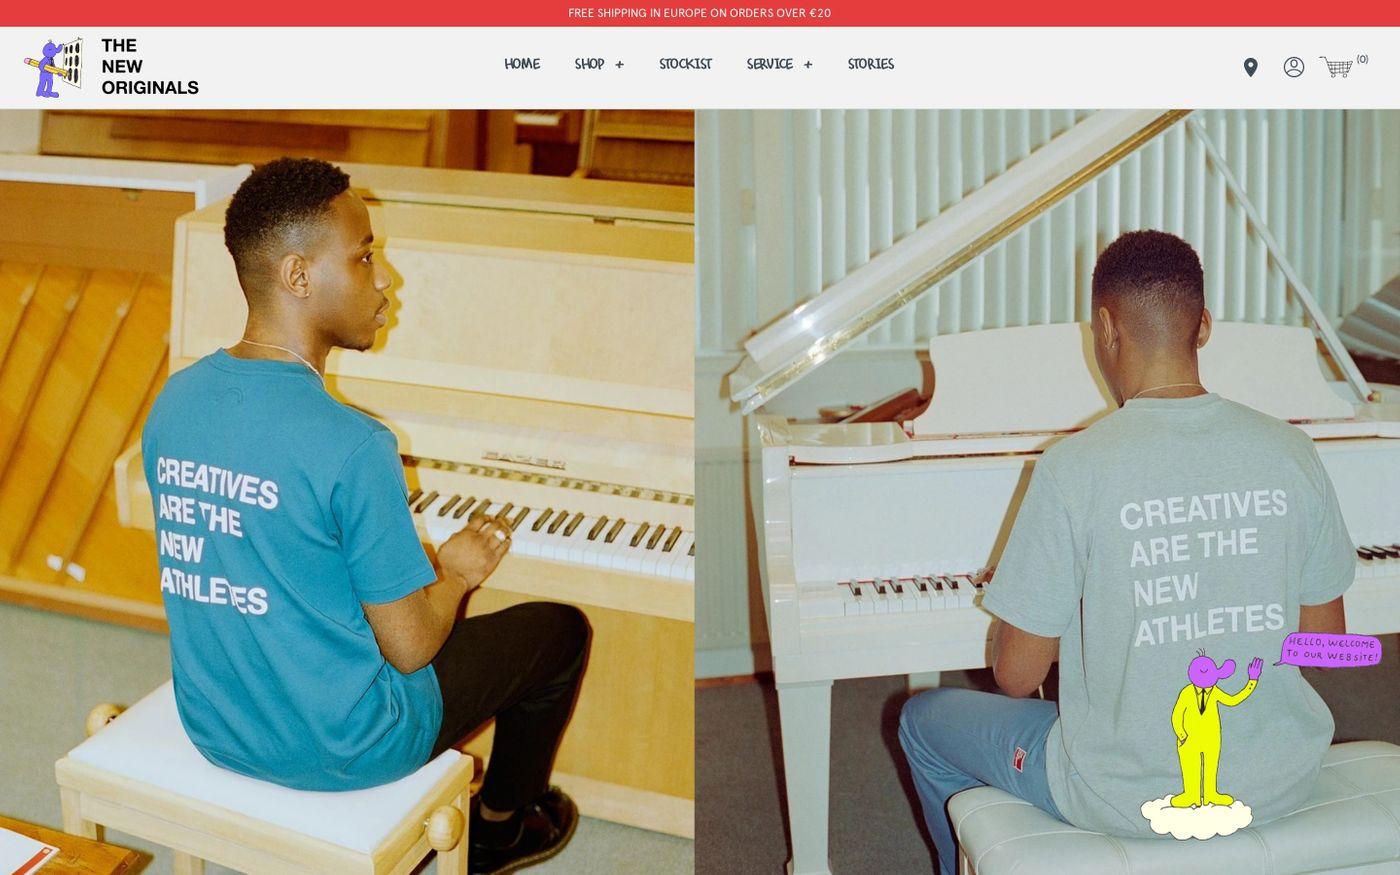 Screenshot of The new originals website